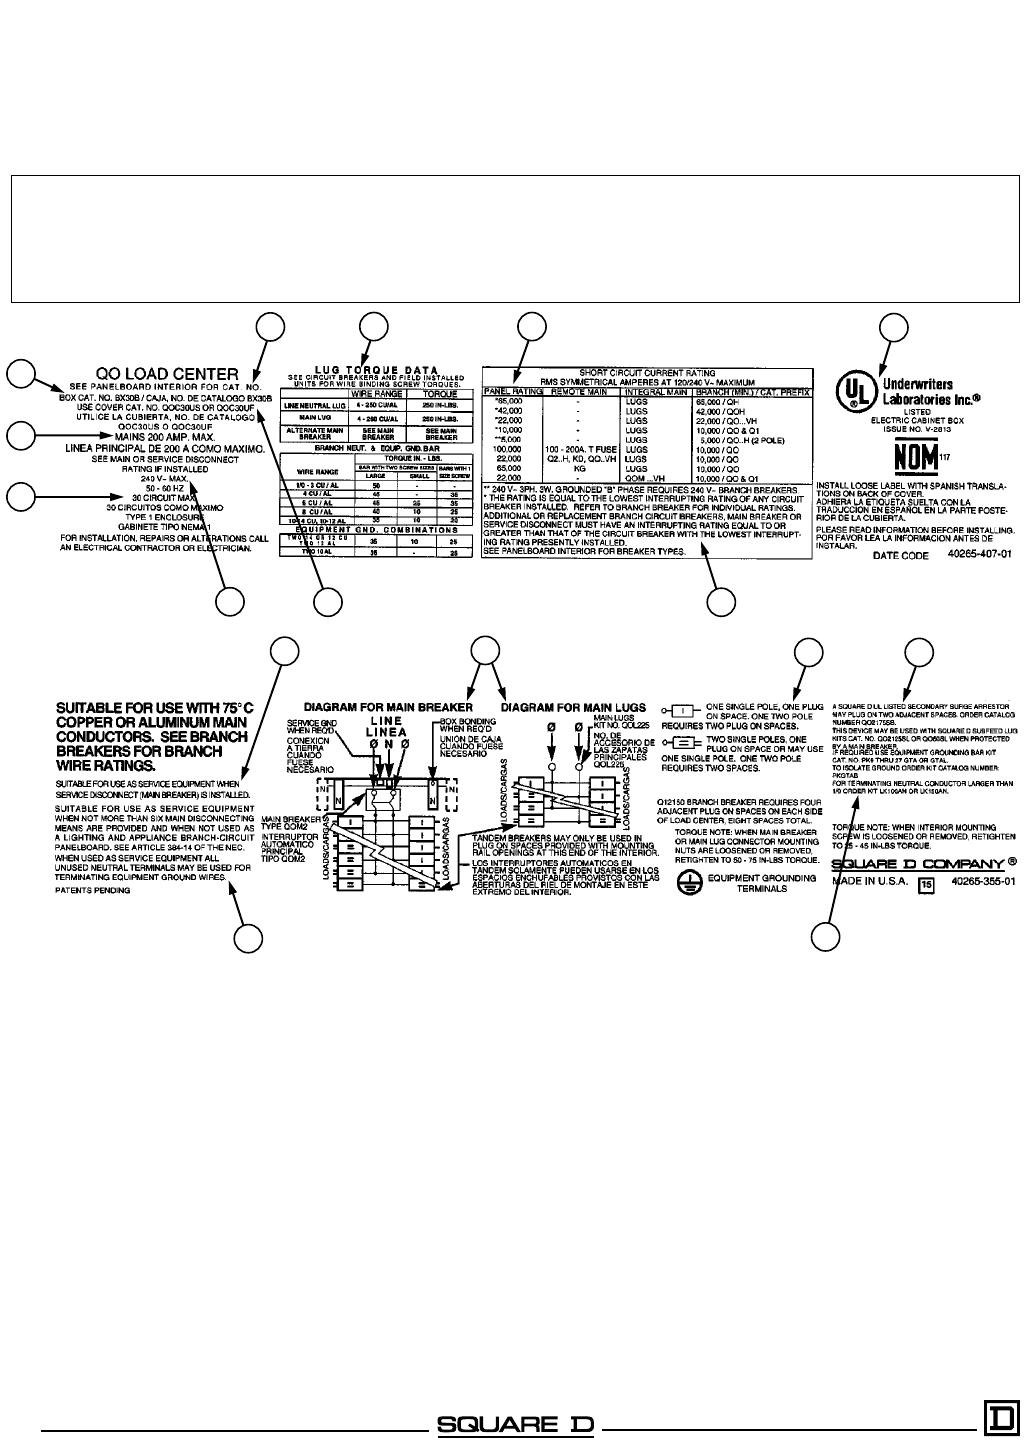 312301 Catalog 30a Load Center Wiring Diagram Qo Circuit Breaker Centers